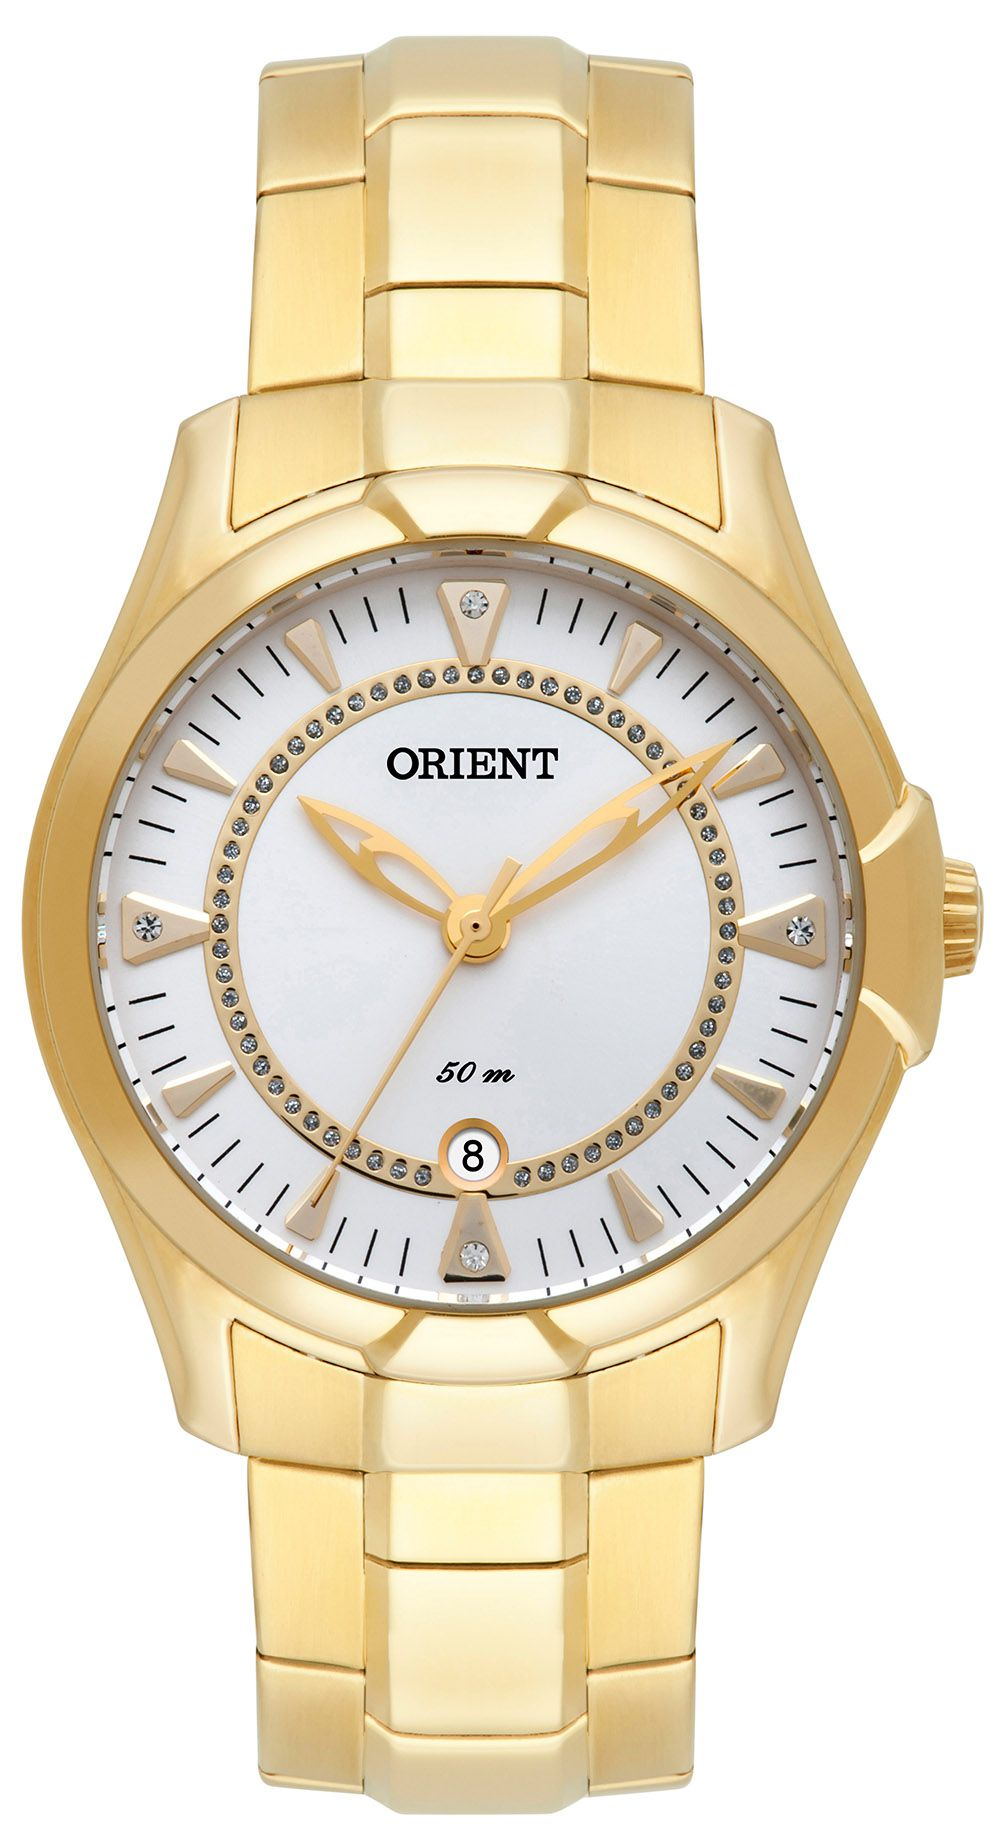 4d9211c3739 Relógio Orient Feminino FGSS1132-S1KX Dourado - PATRICIA JOIAS